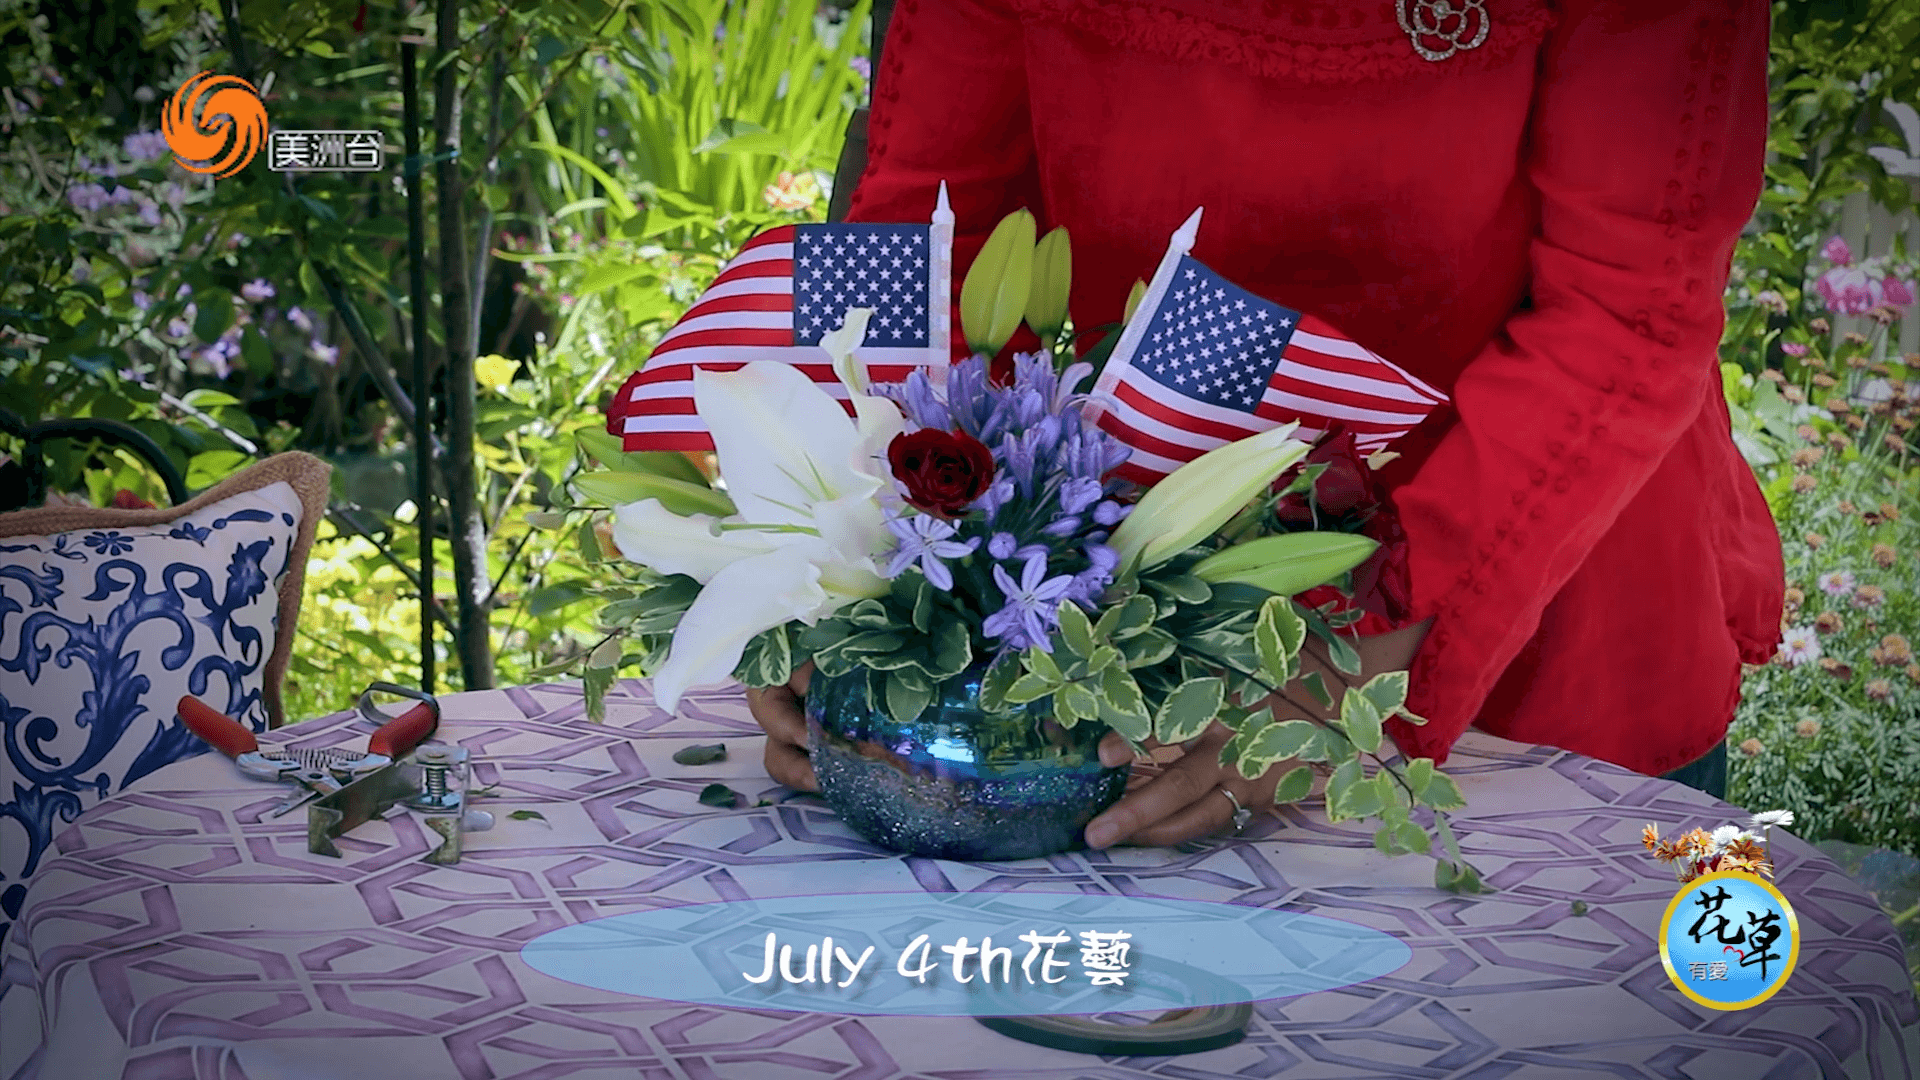 July 4th 花艺